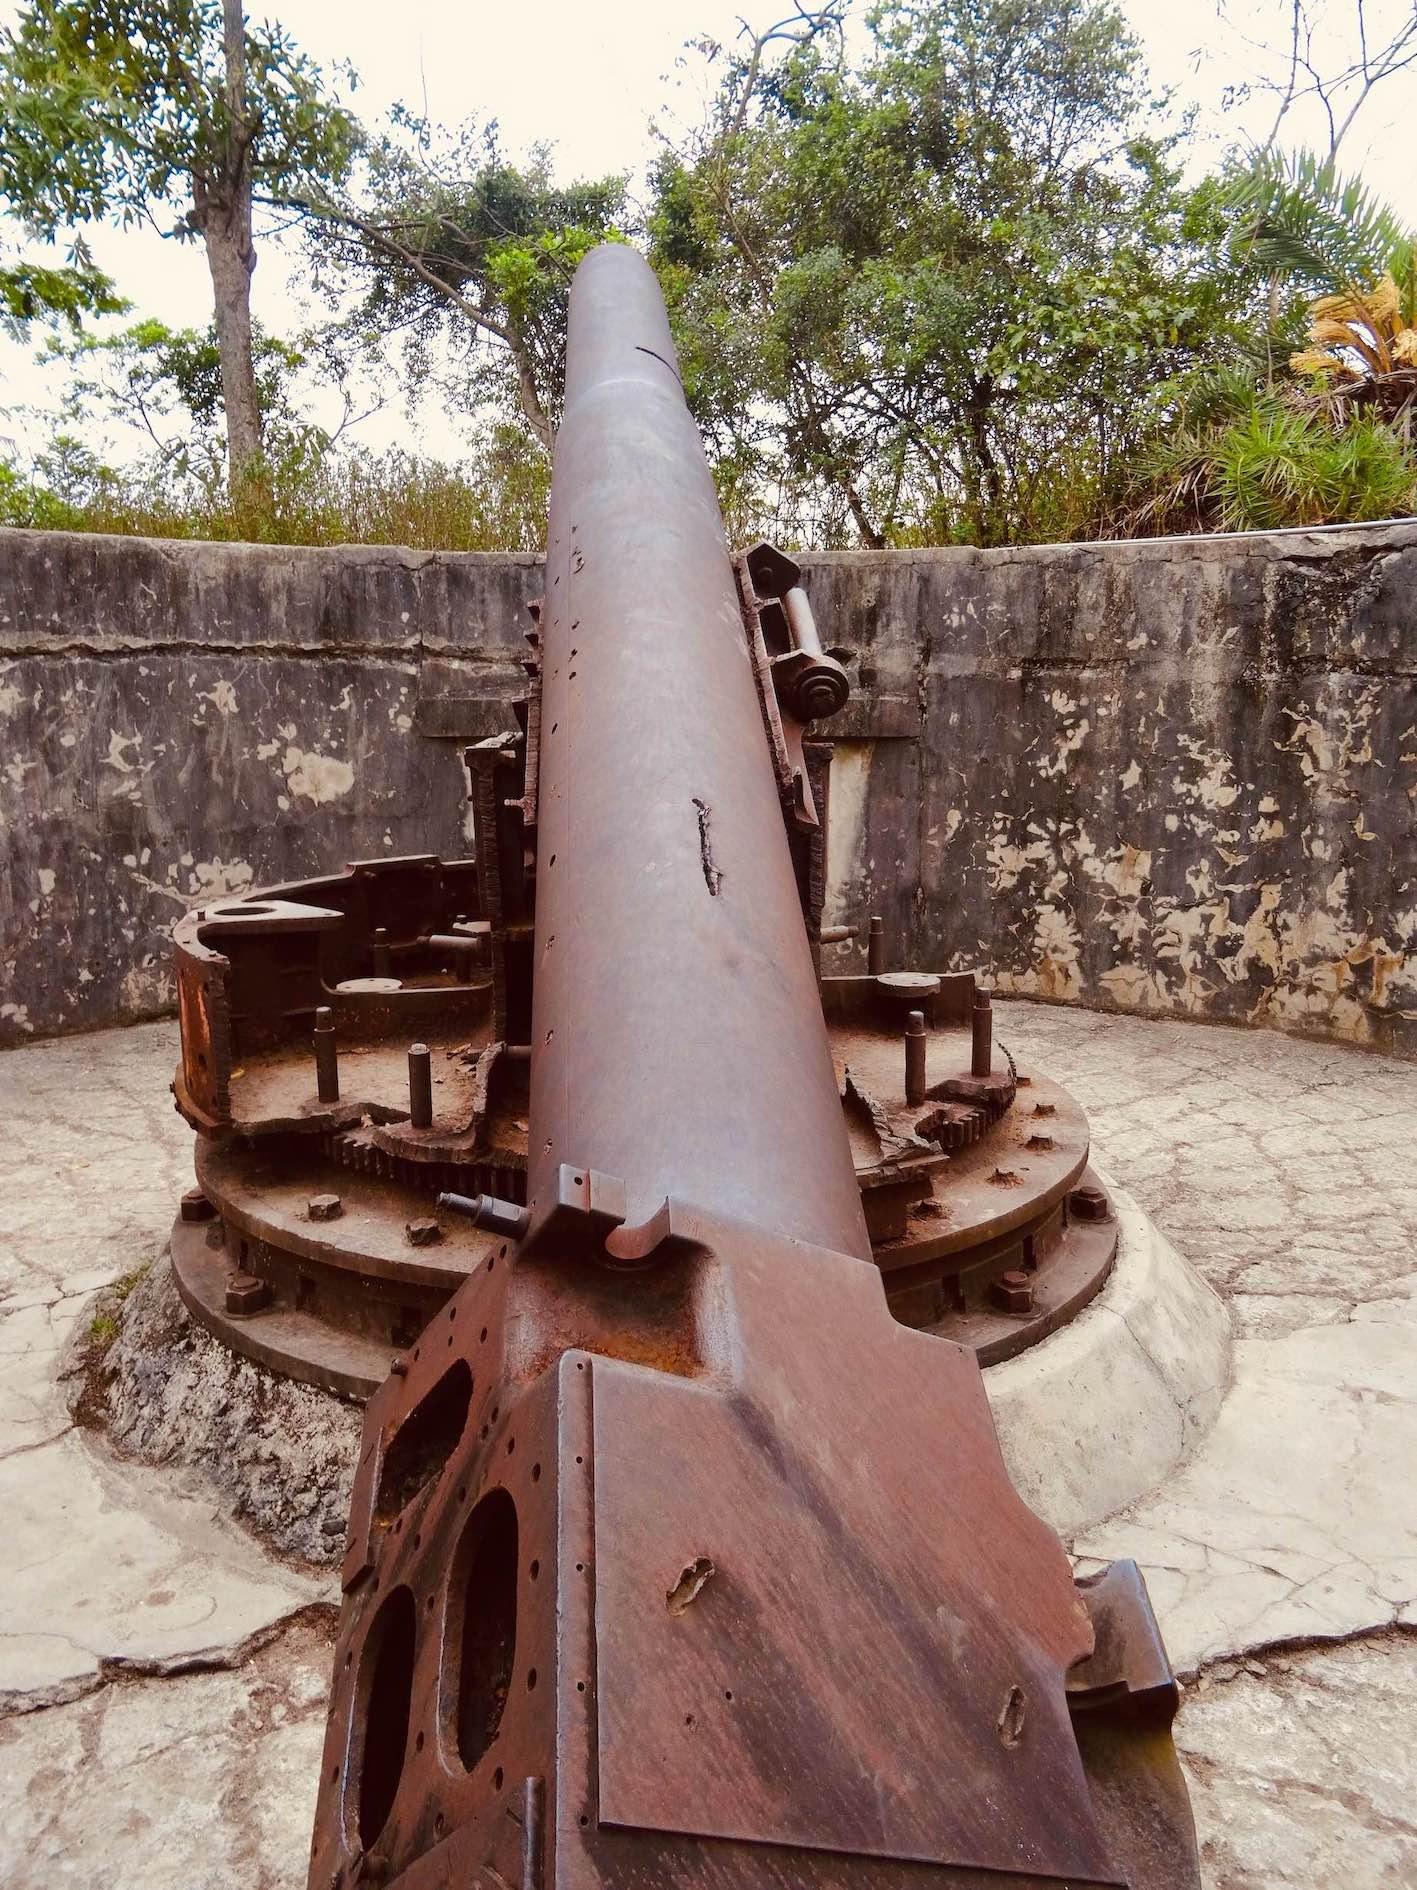 French Anti warship cannon Vietnam